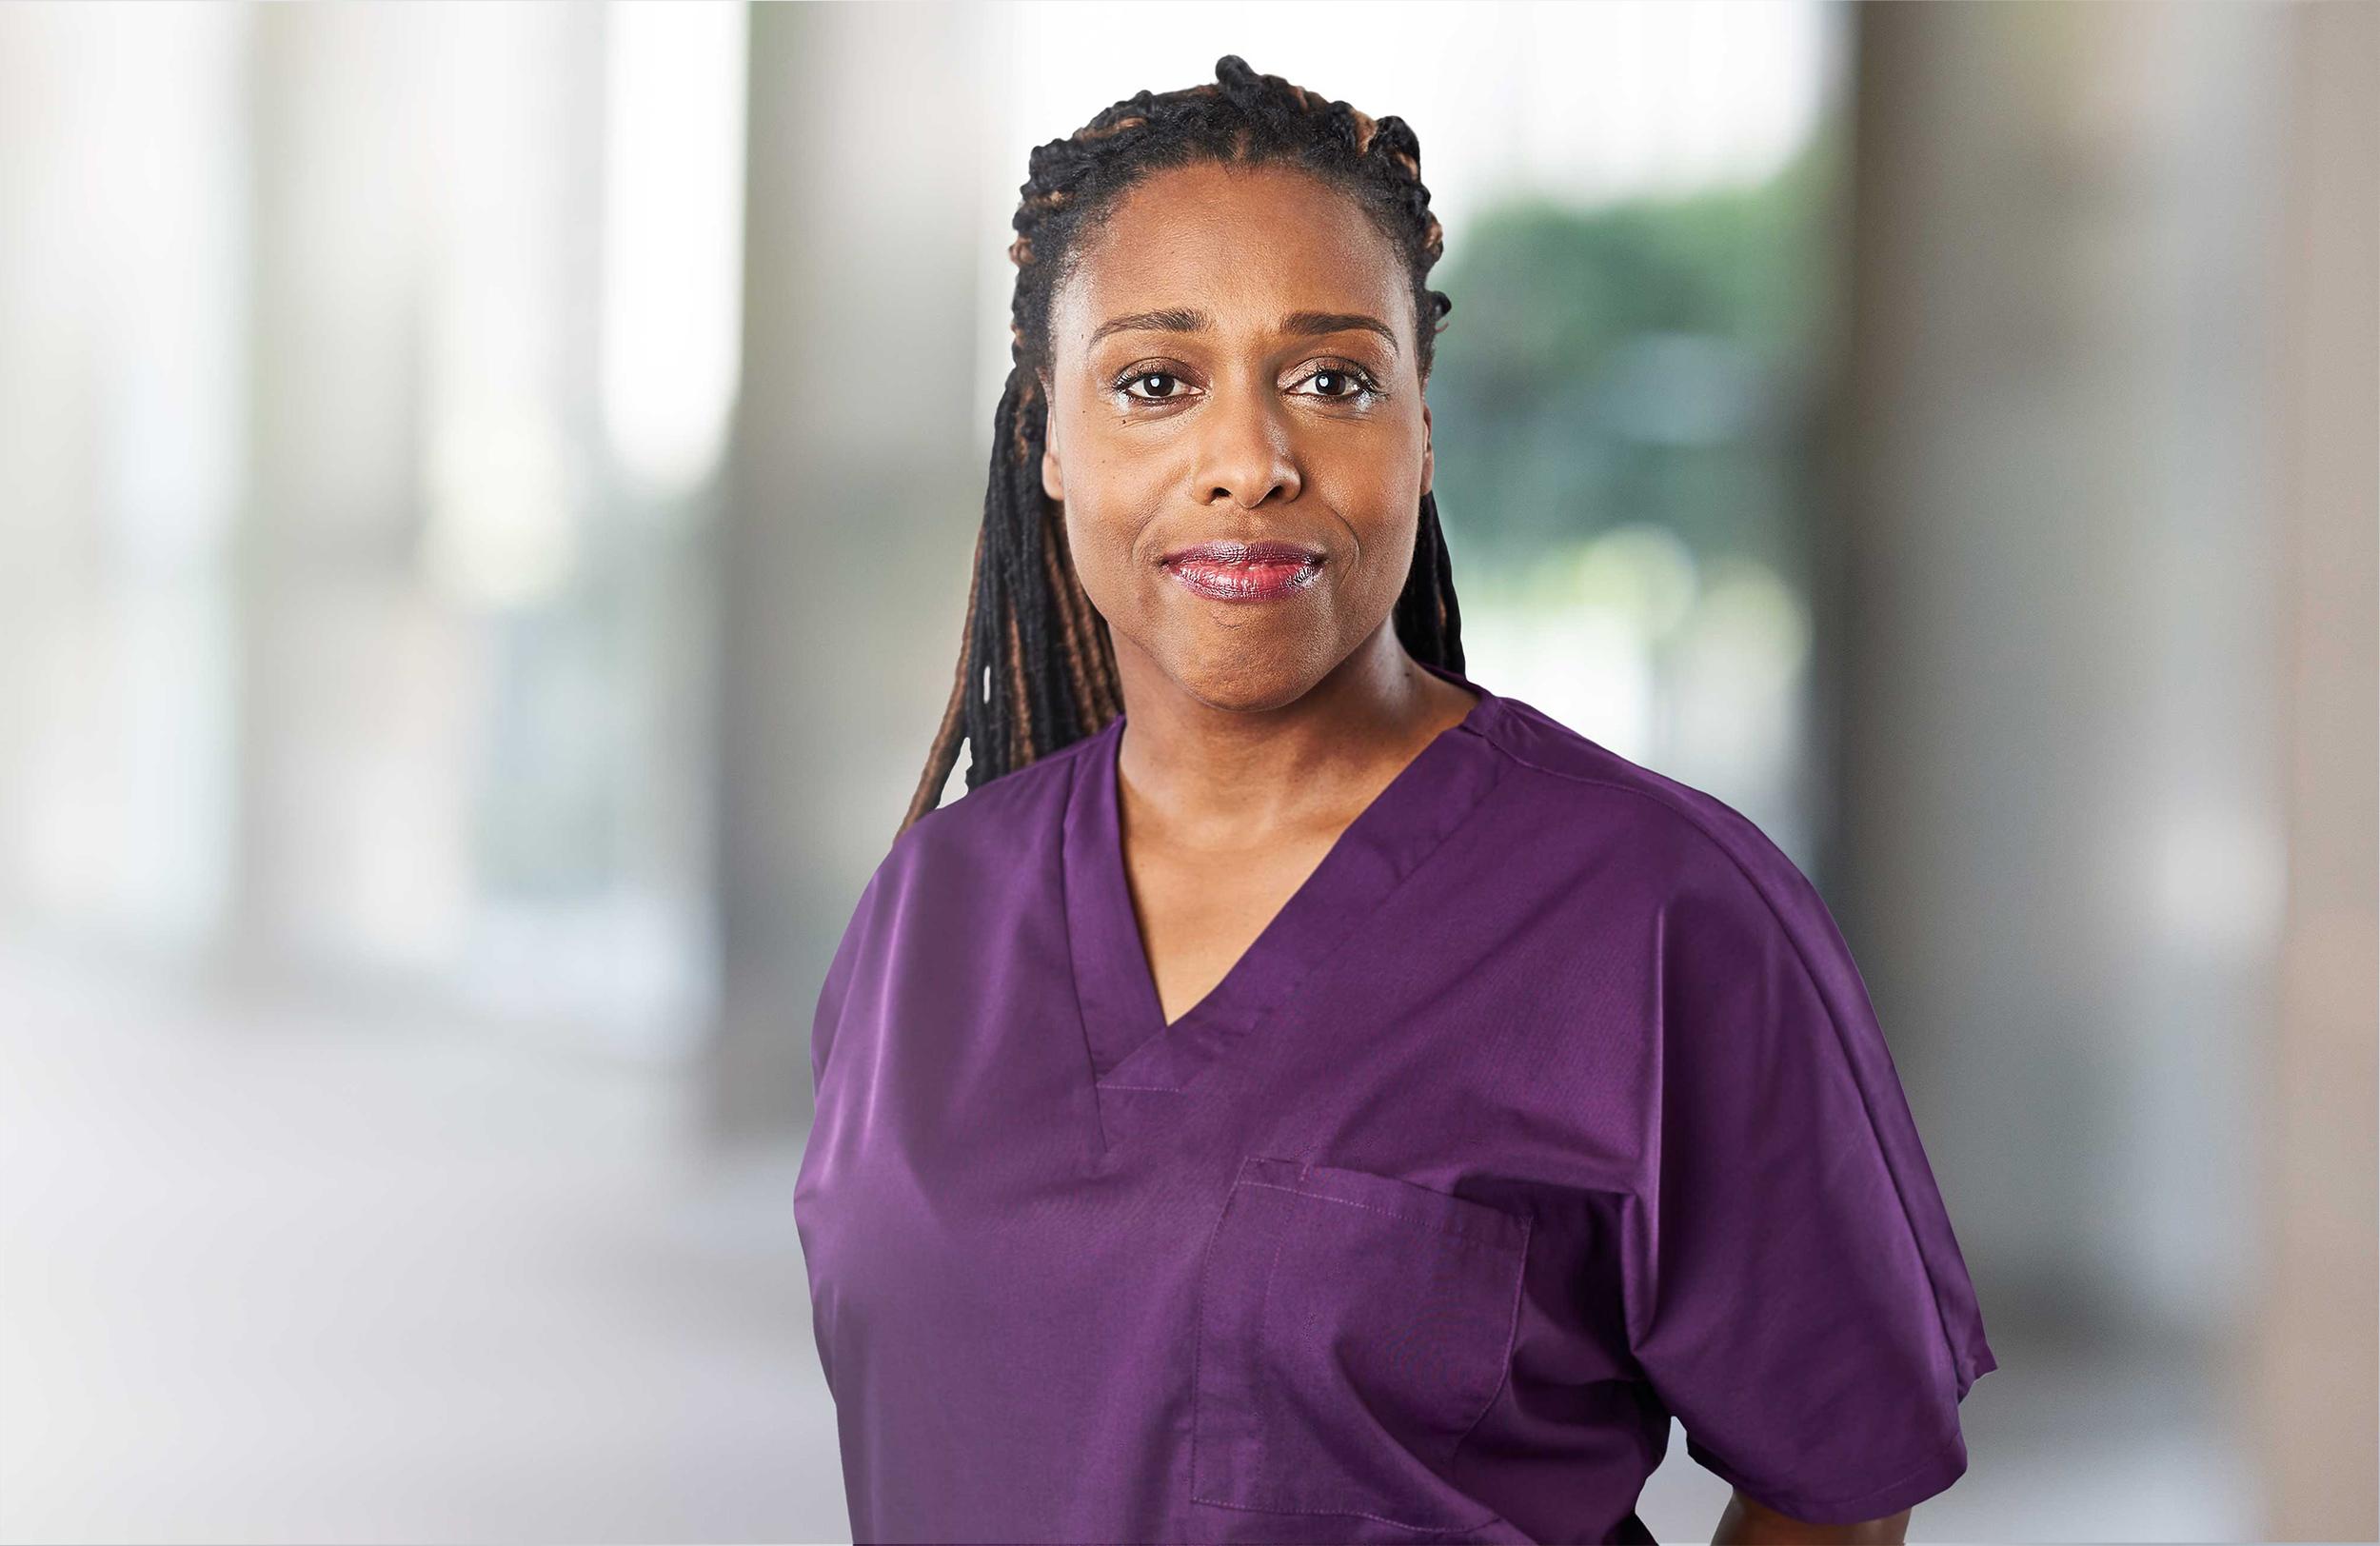 AANA (American Association of Nurse Anesthetists)